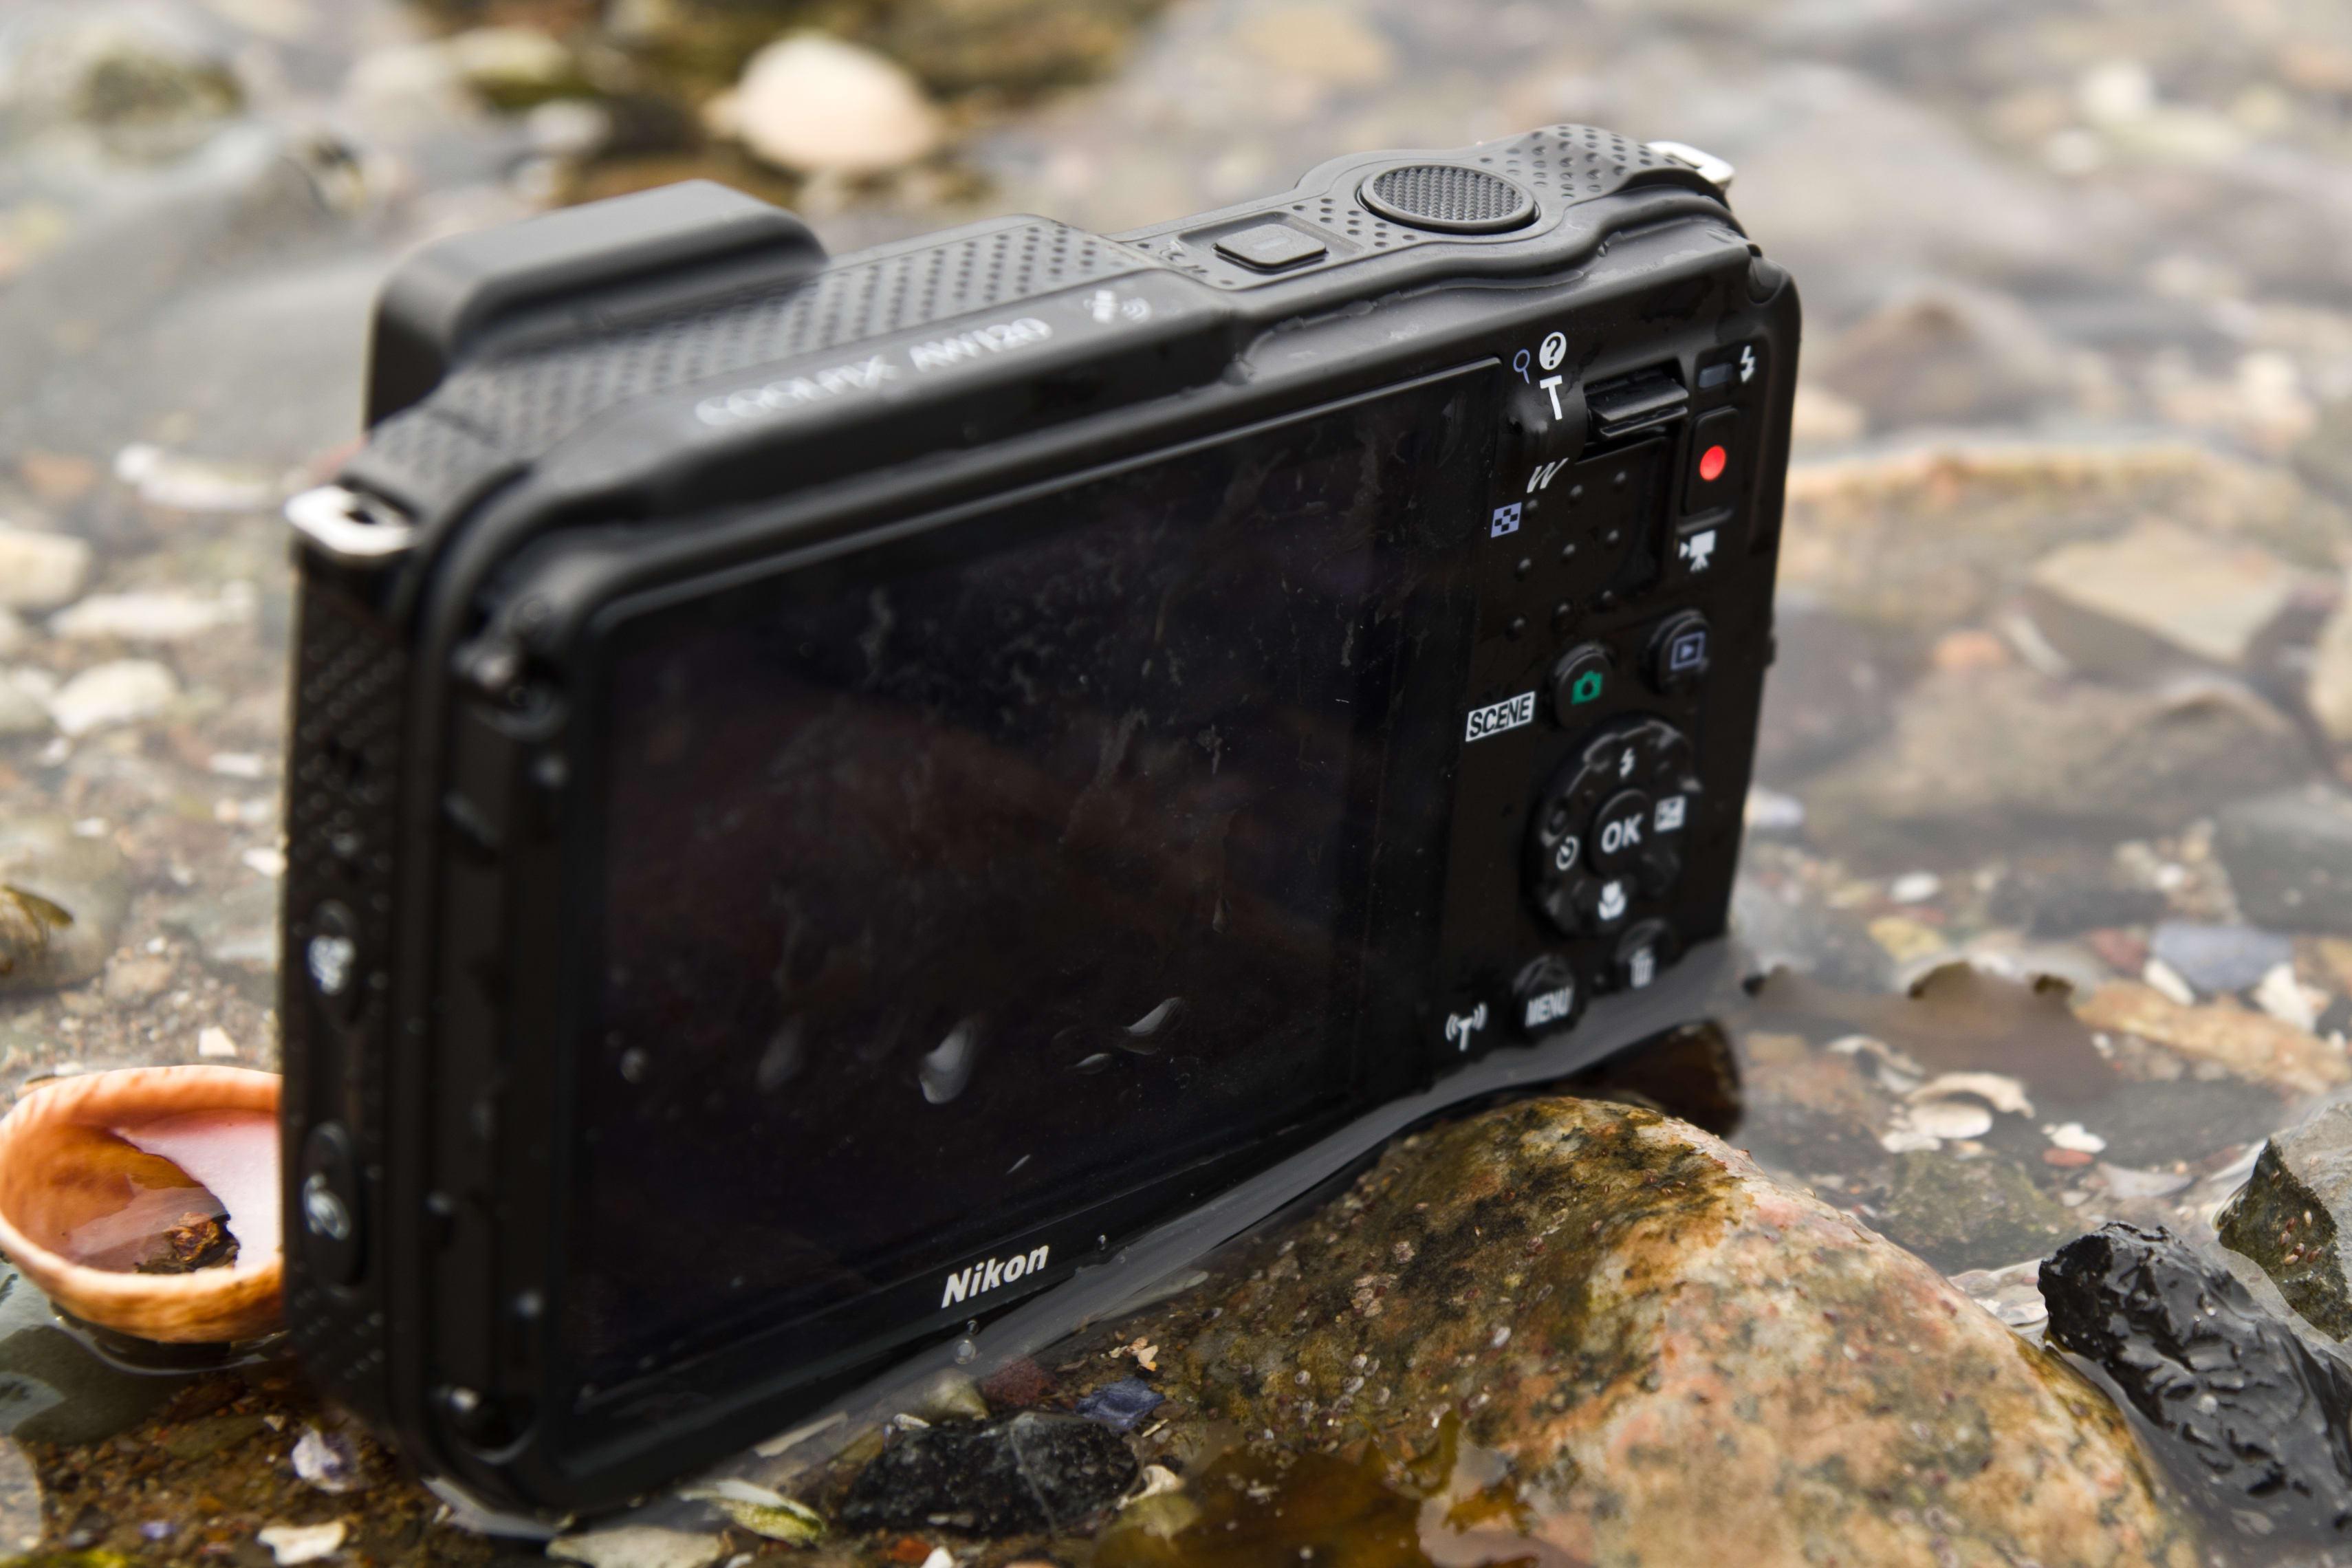 A shot of the Nikon Coolpix AW120's screen.